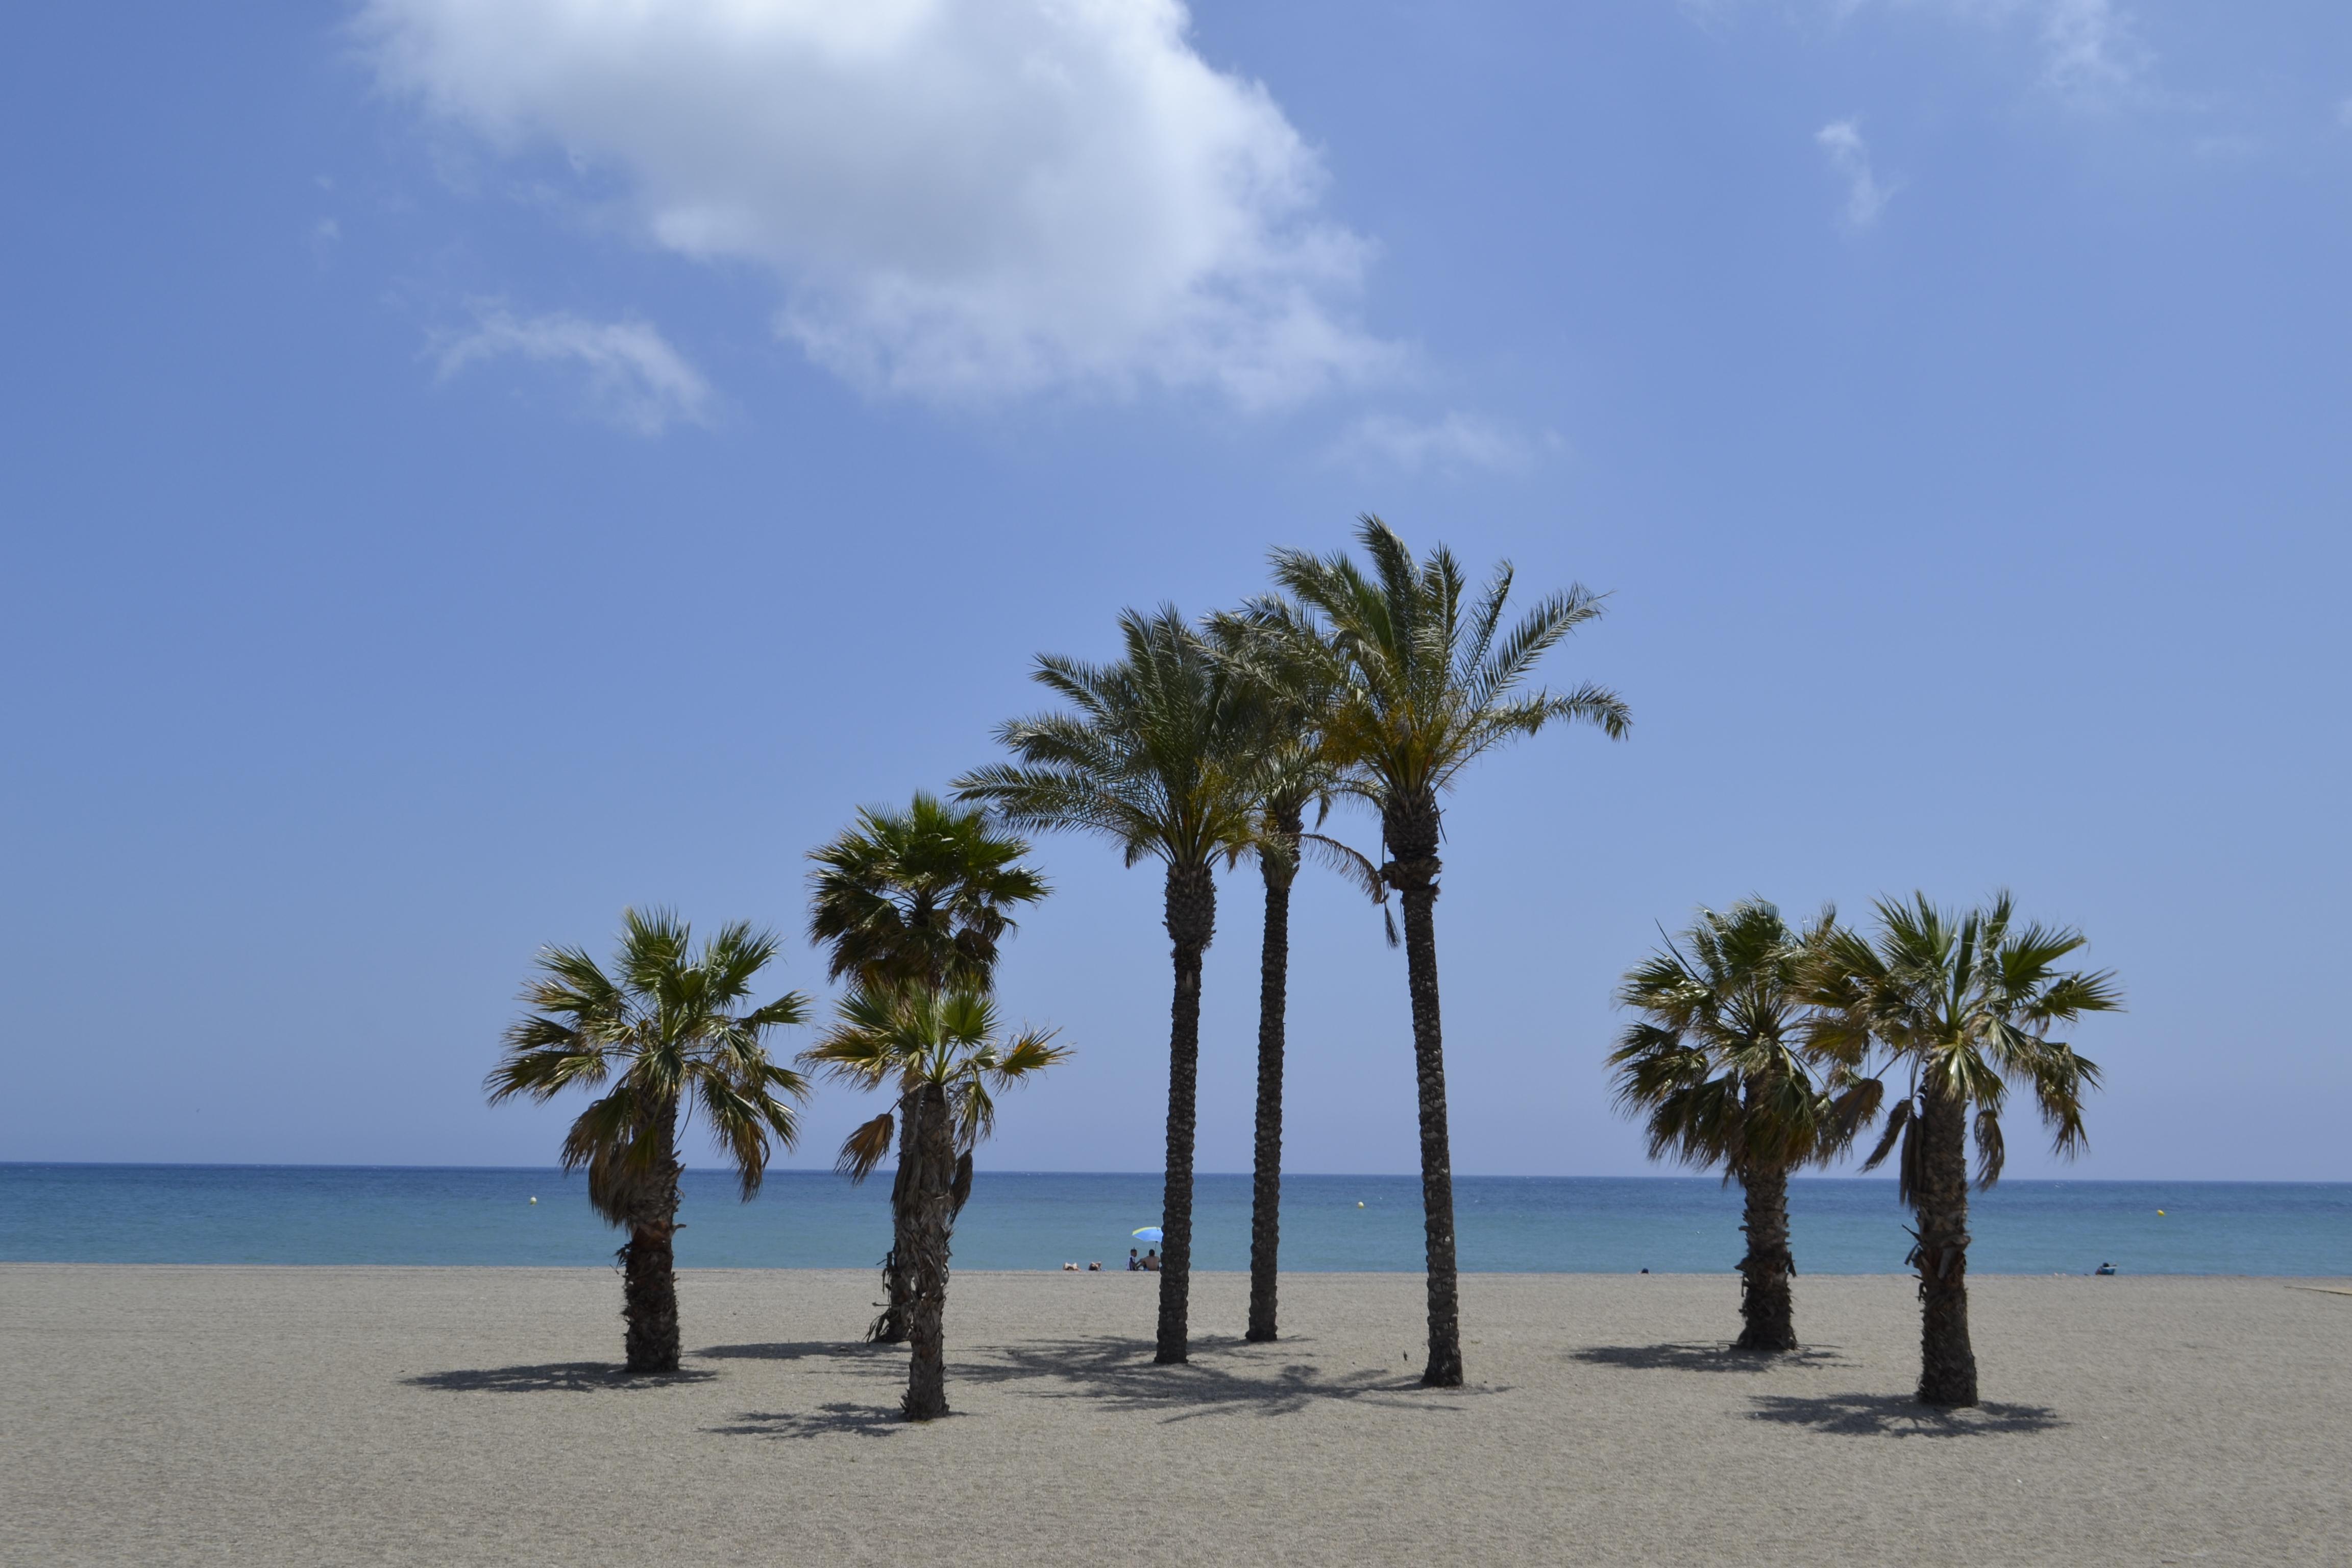 hiszpańska plaża